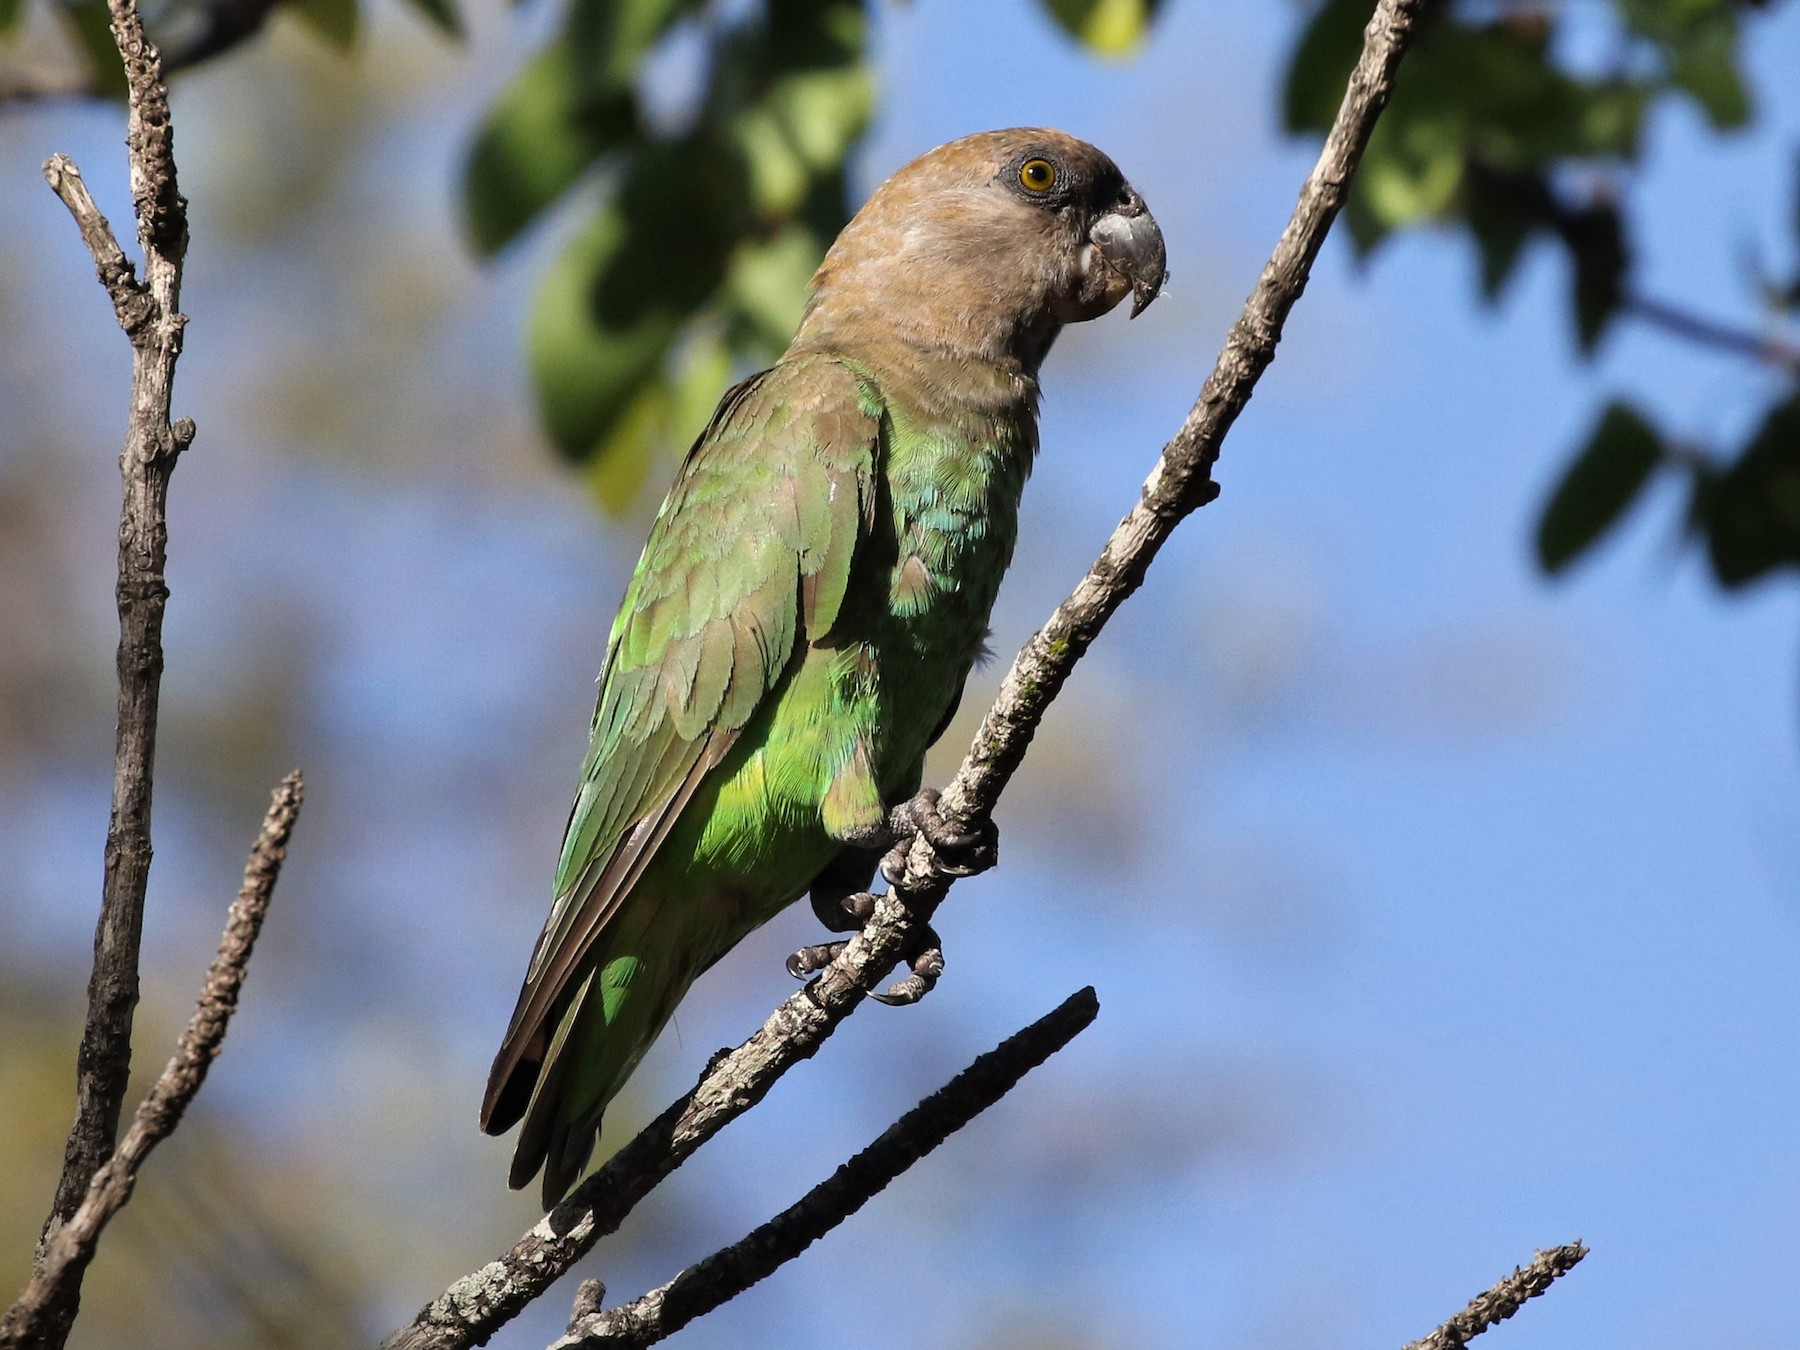 Brown-headed Parrot - Dean LaTray